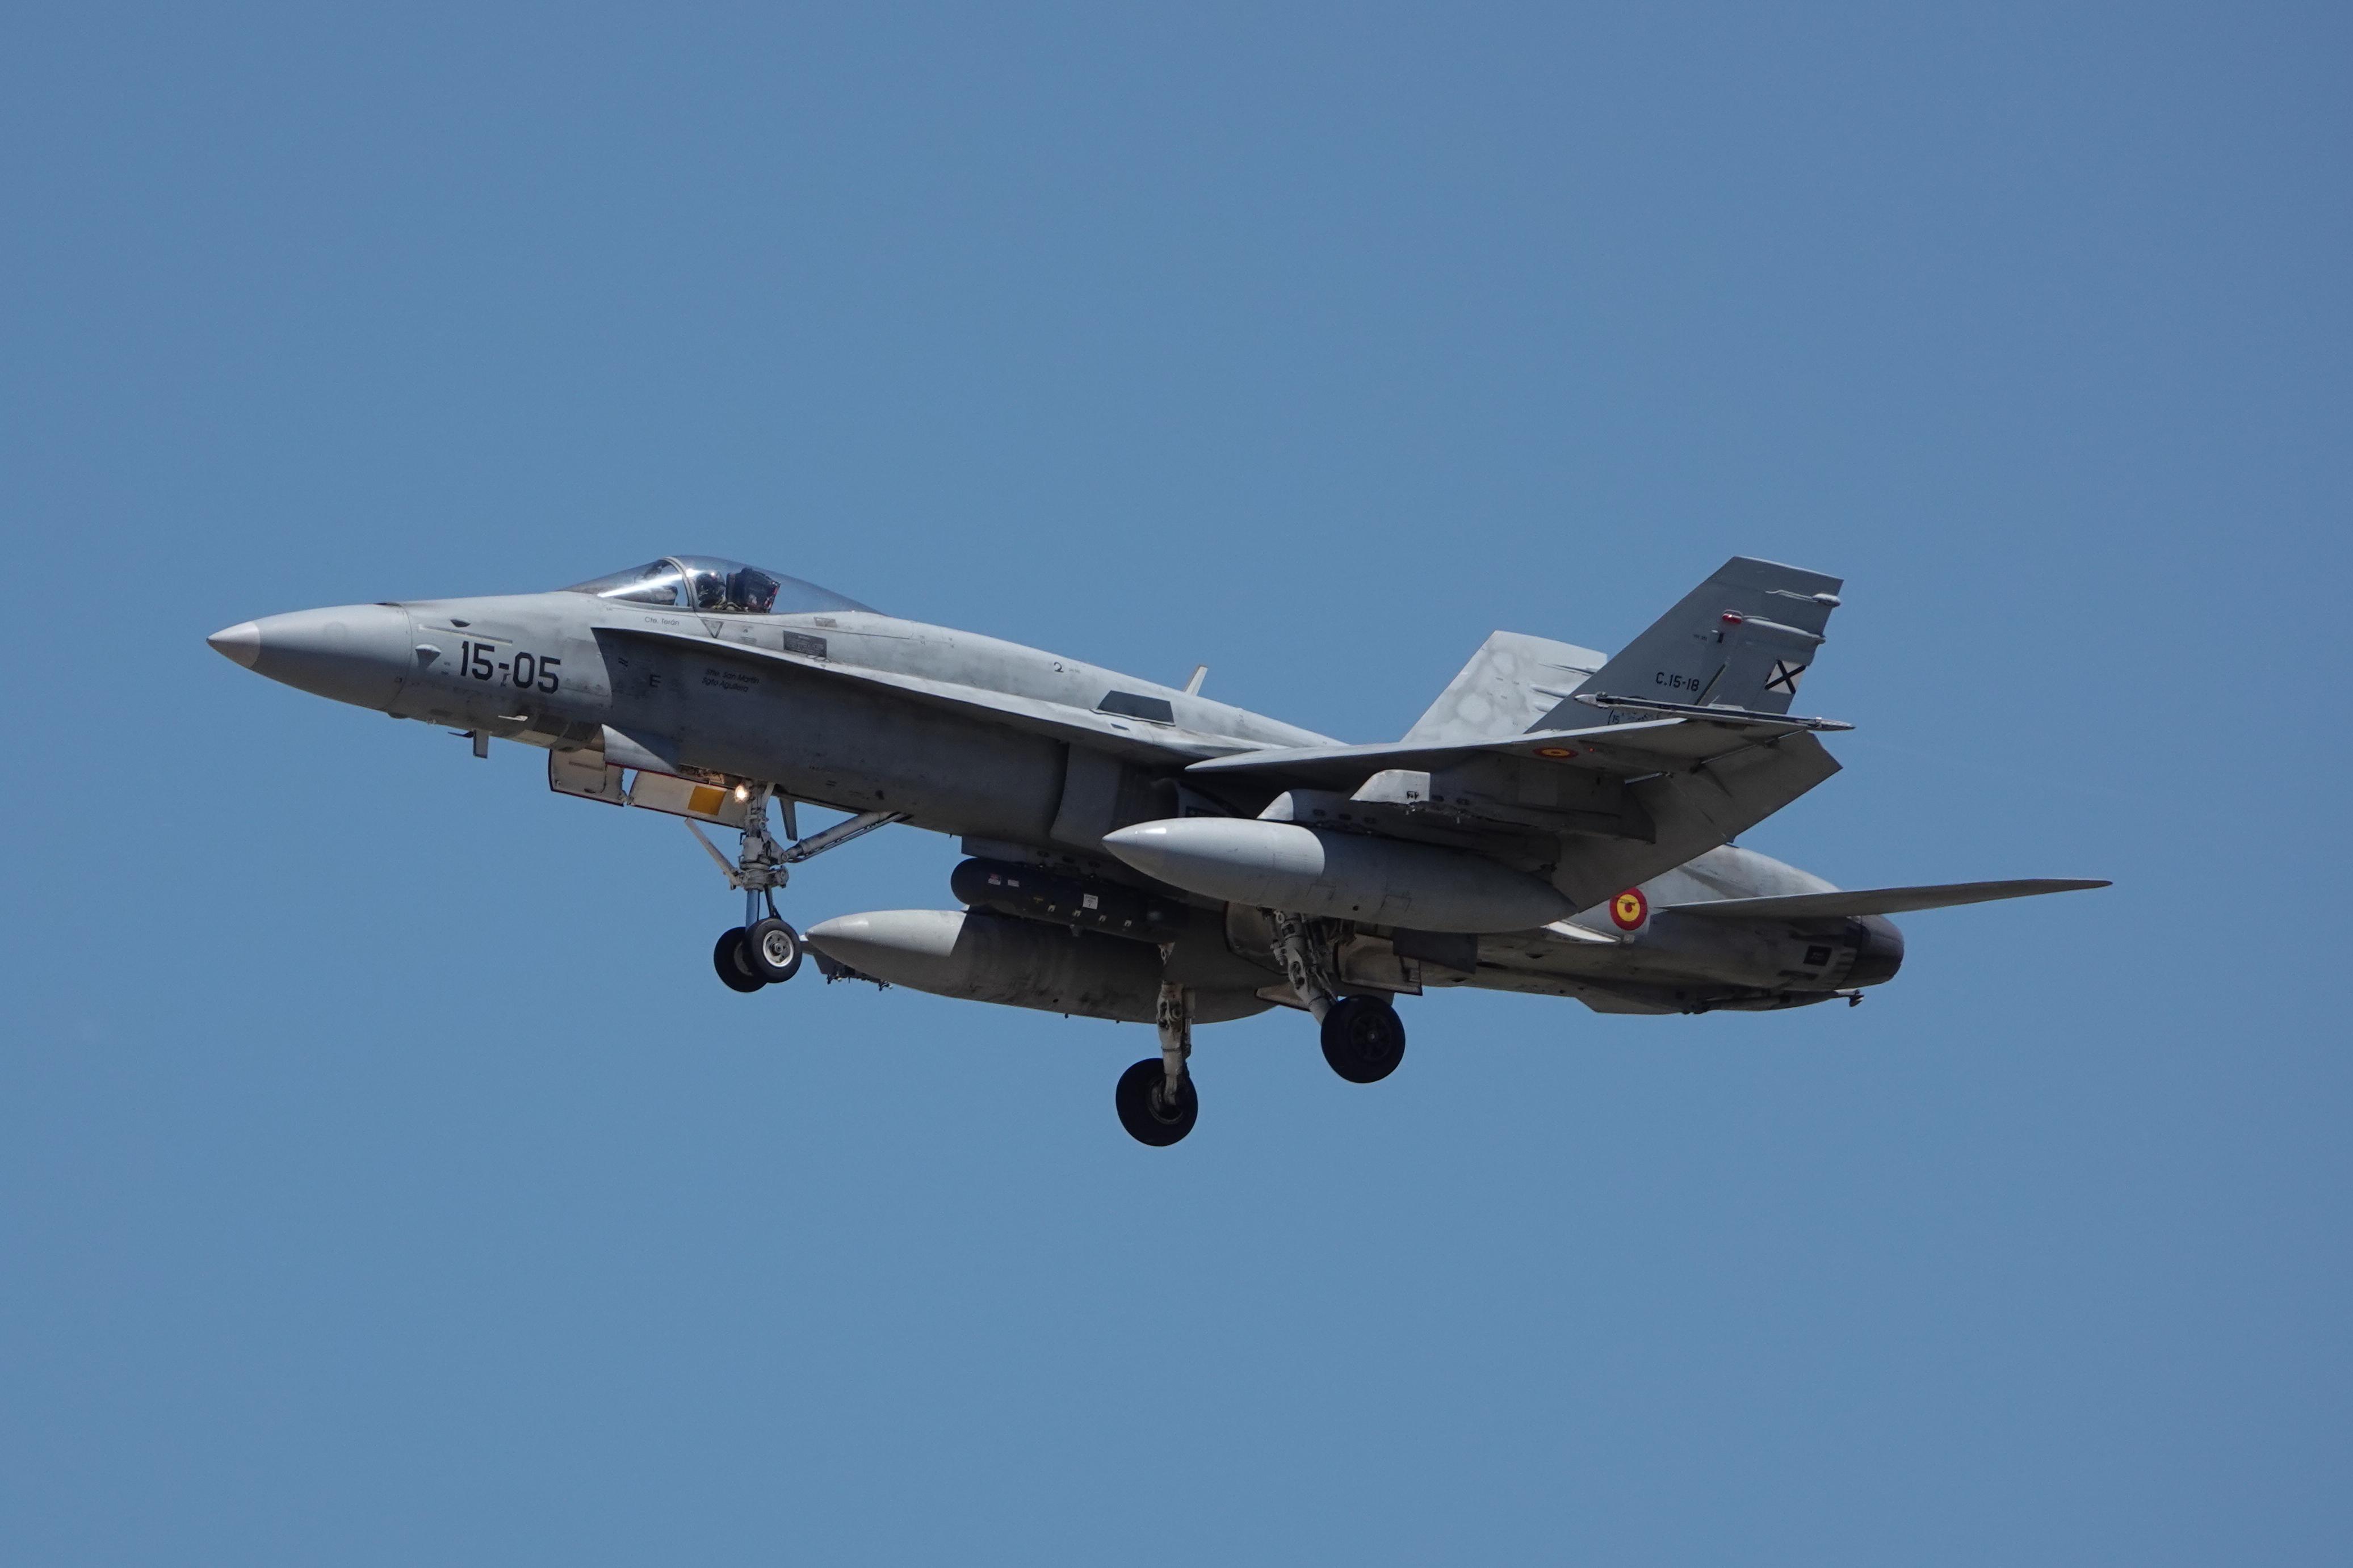 F-18 15-05